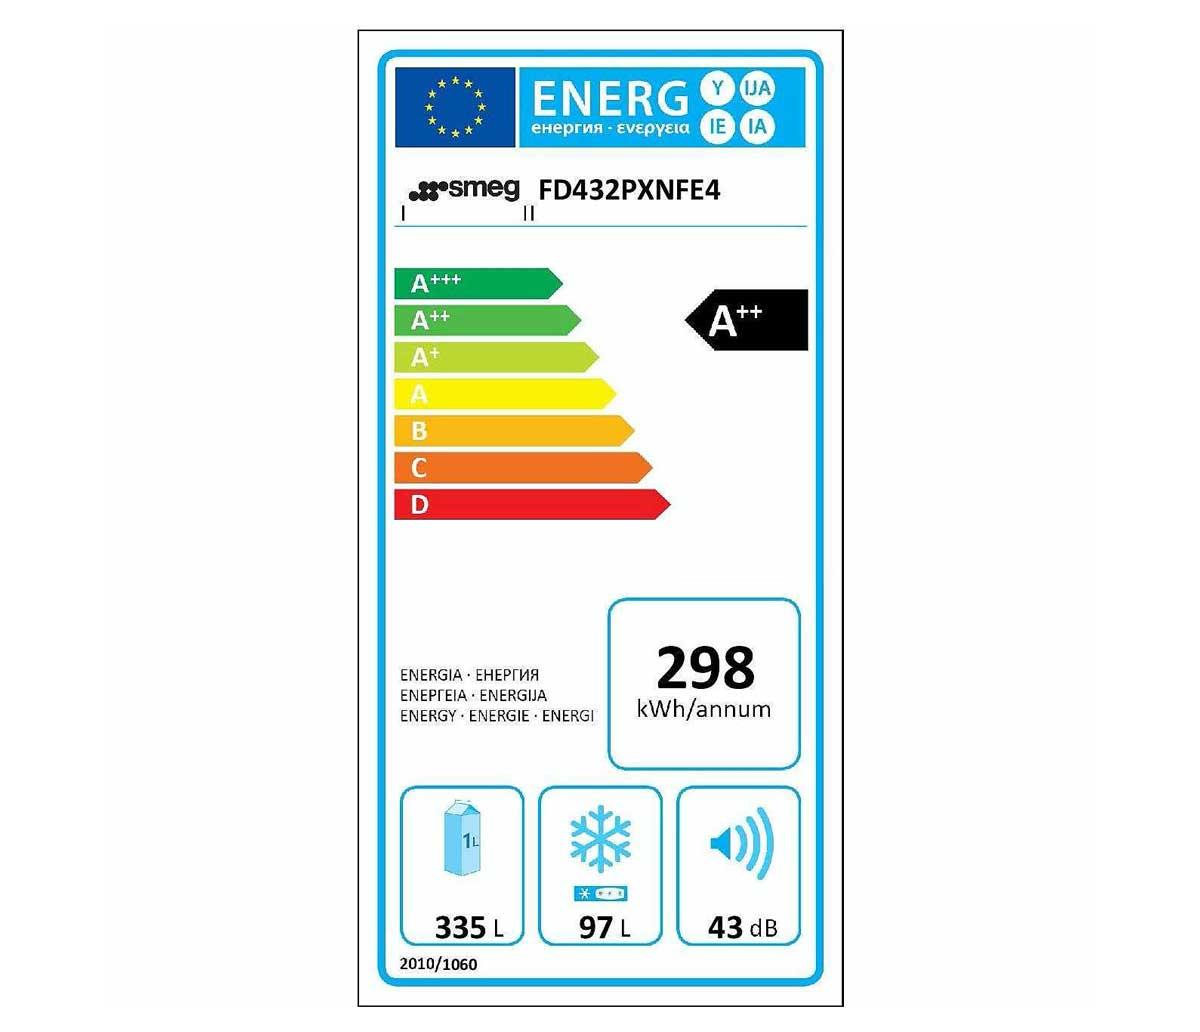 SMEG FD432PXNFE4 etichetta energetica